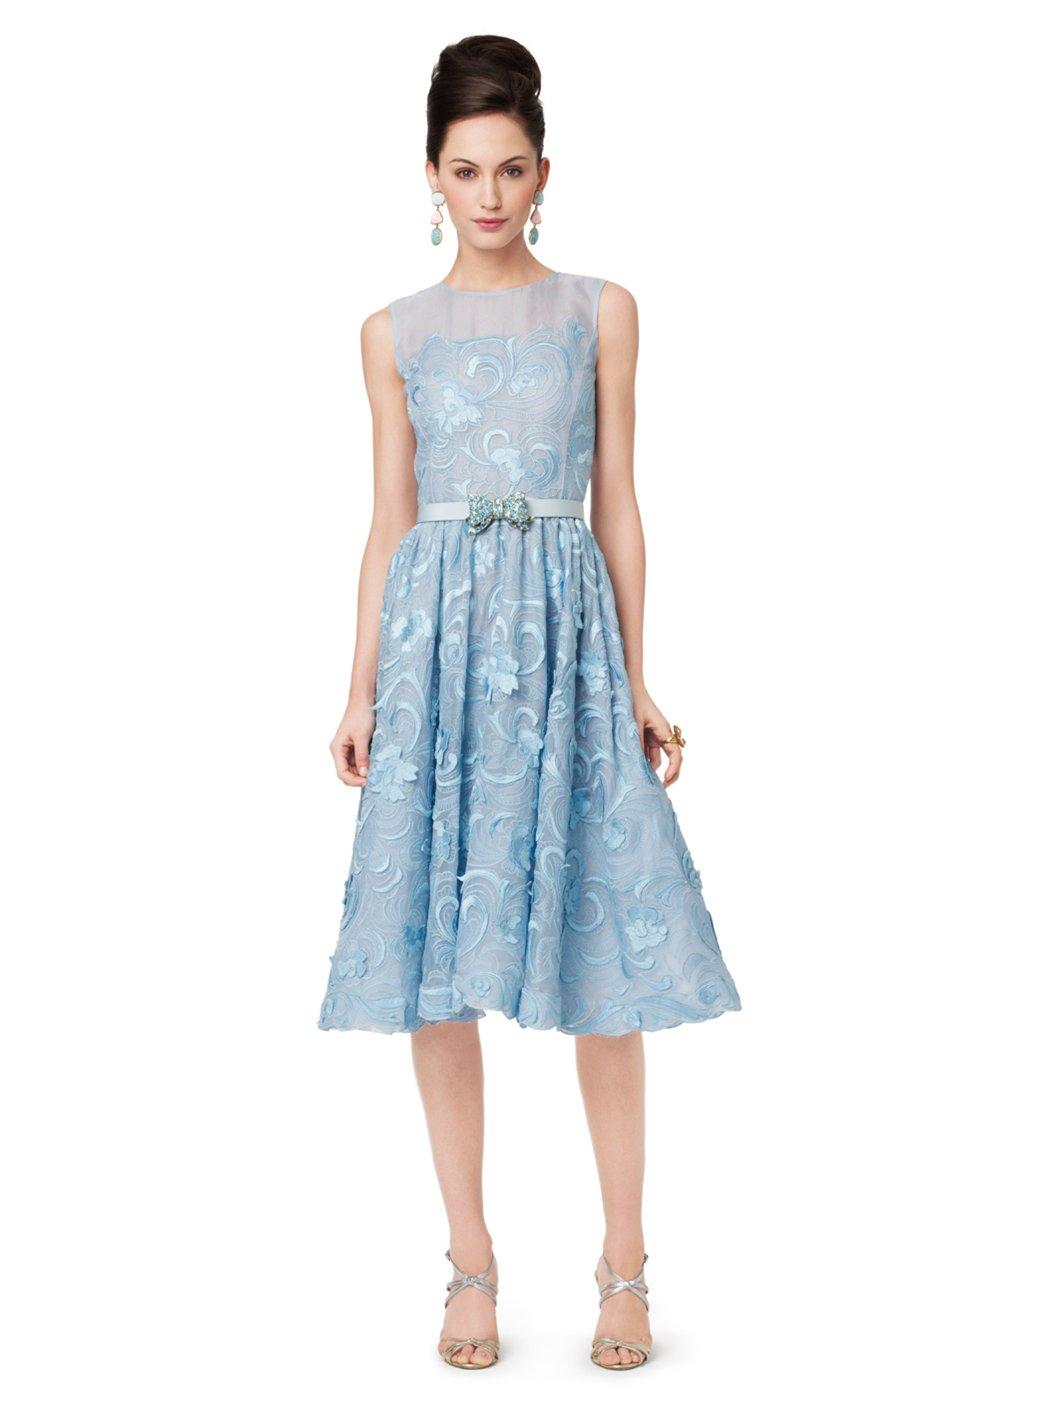 Oscar De La Renta Sleeveless Dress with Gathered Skirt in ...